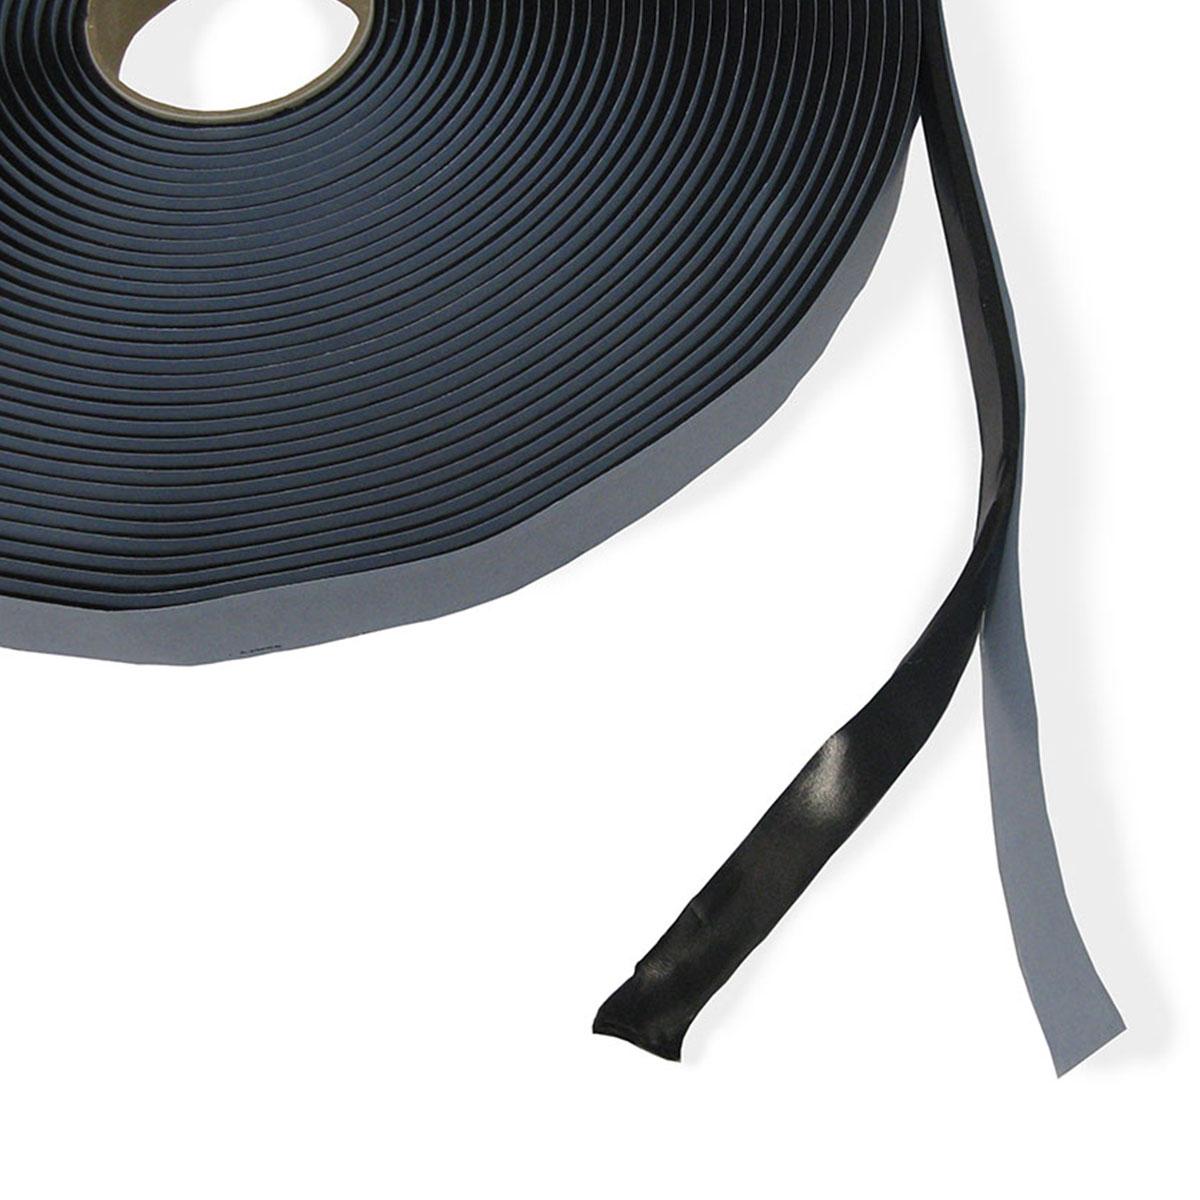 tape heat resistant black 3mm x 12mm x 15metres